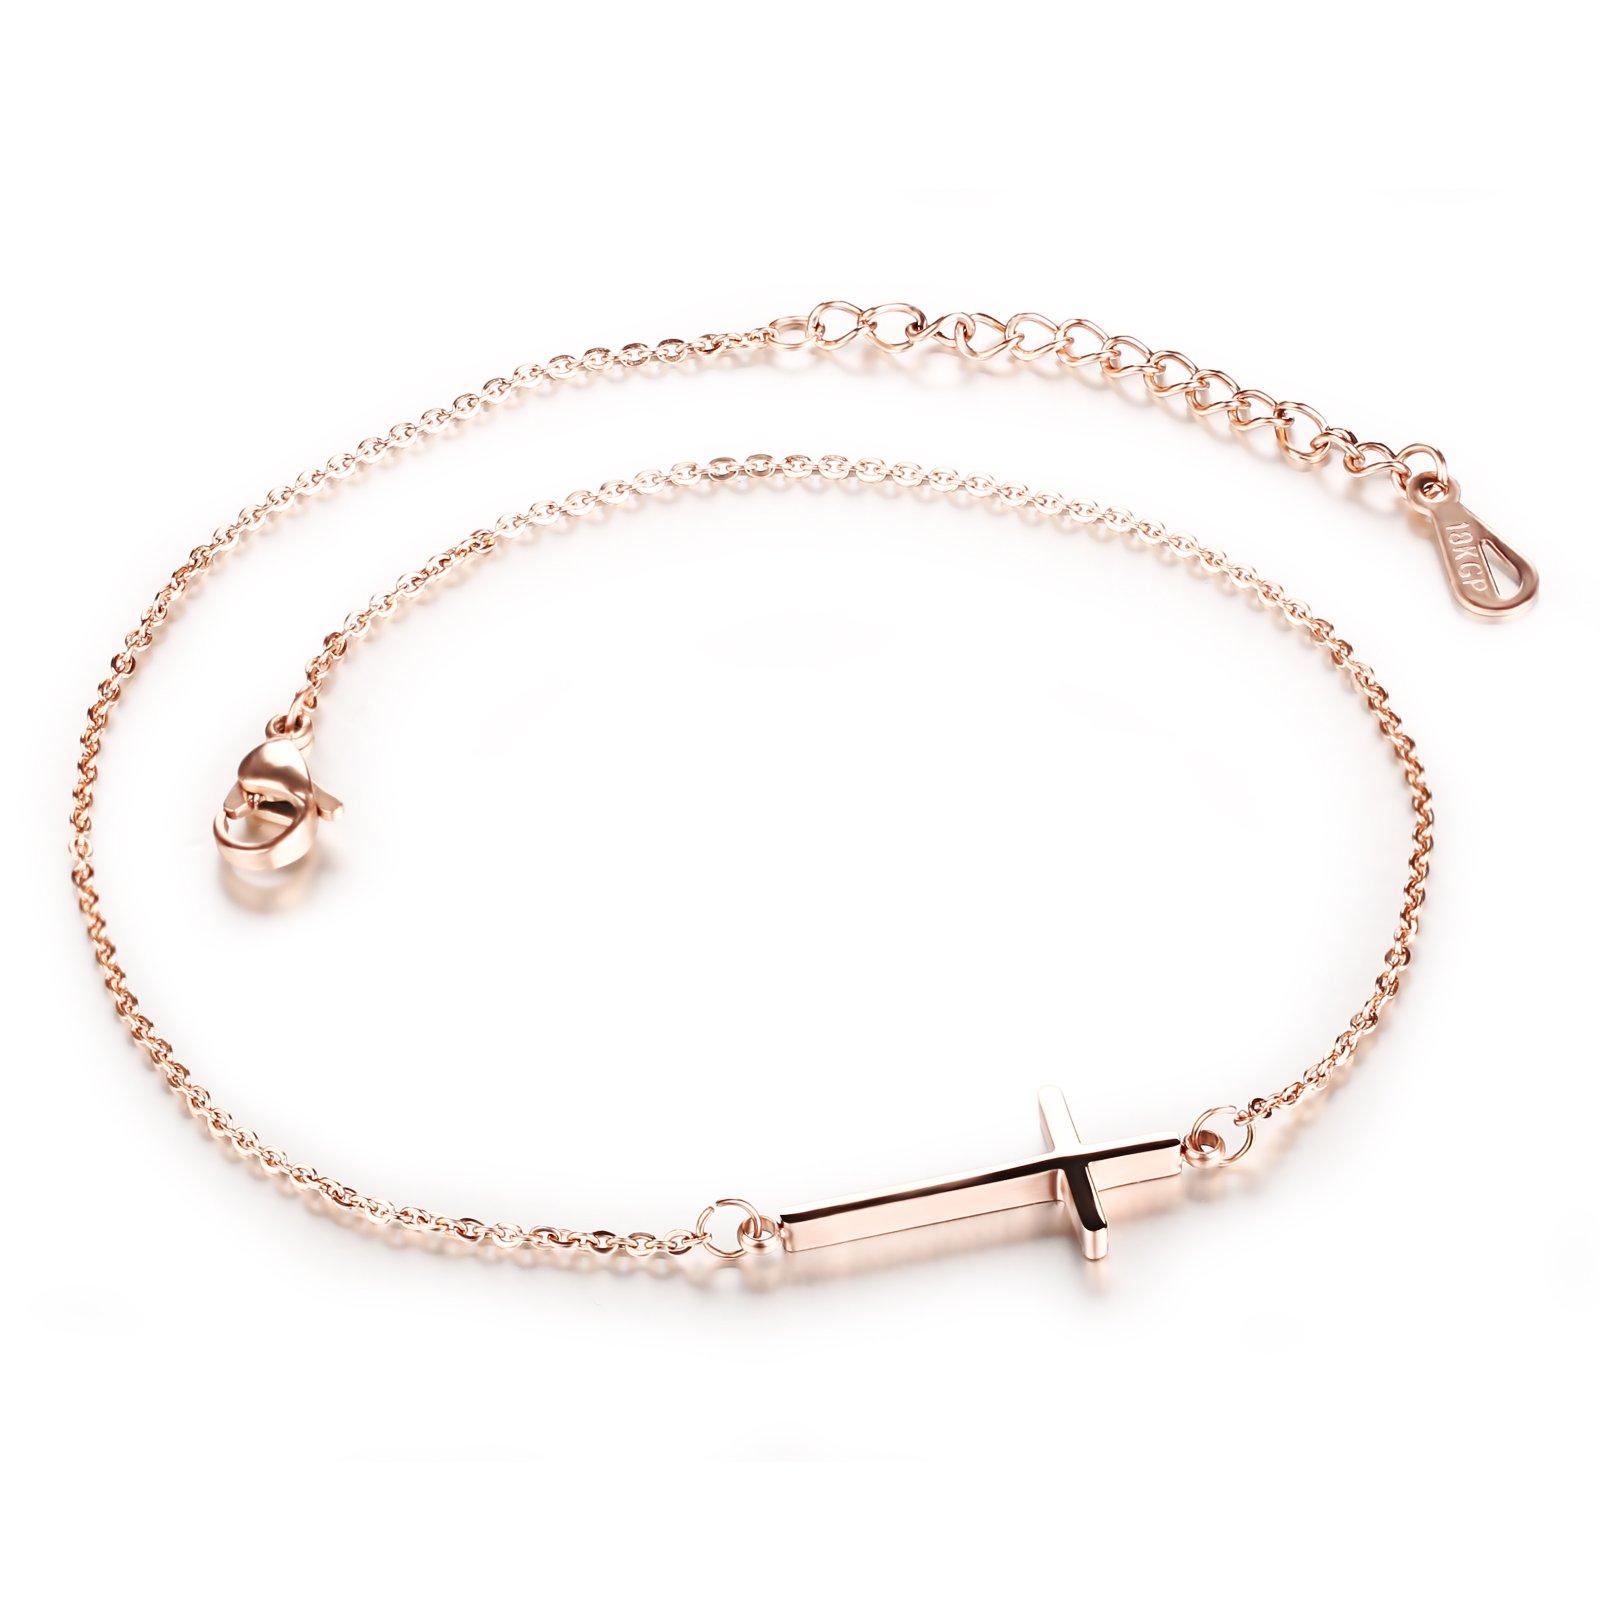 Fate Love Sideways Cross Anklet Bracelet Women, Rose Gold Stainless Steel Adjustable Size, 11''